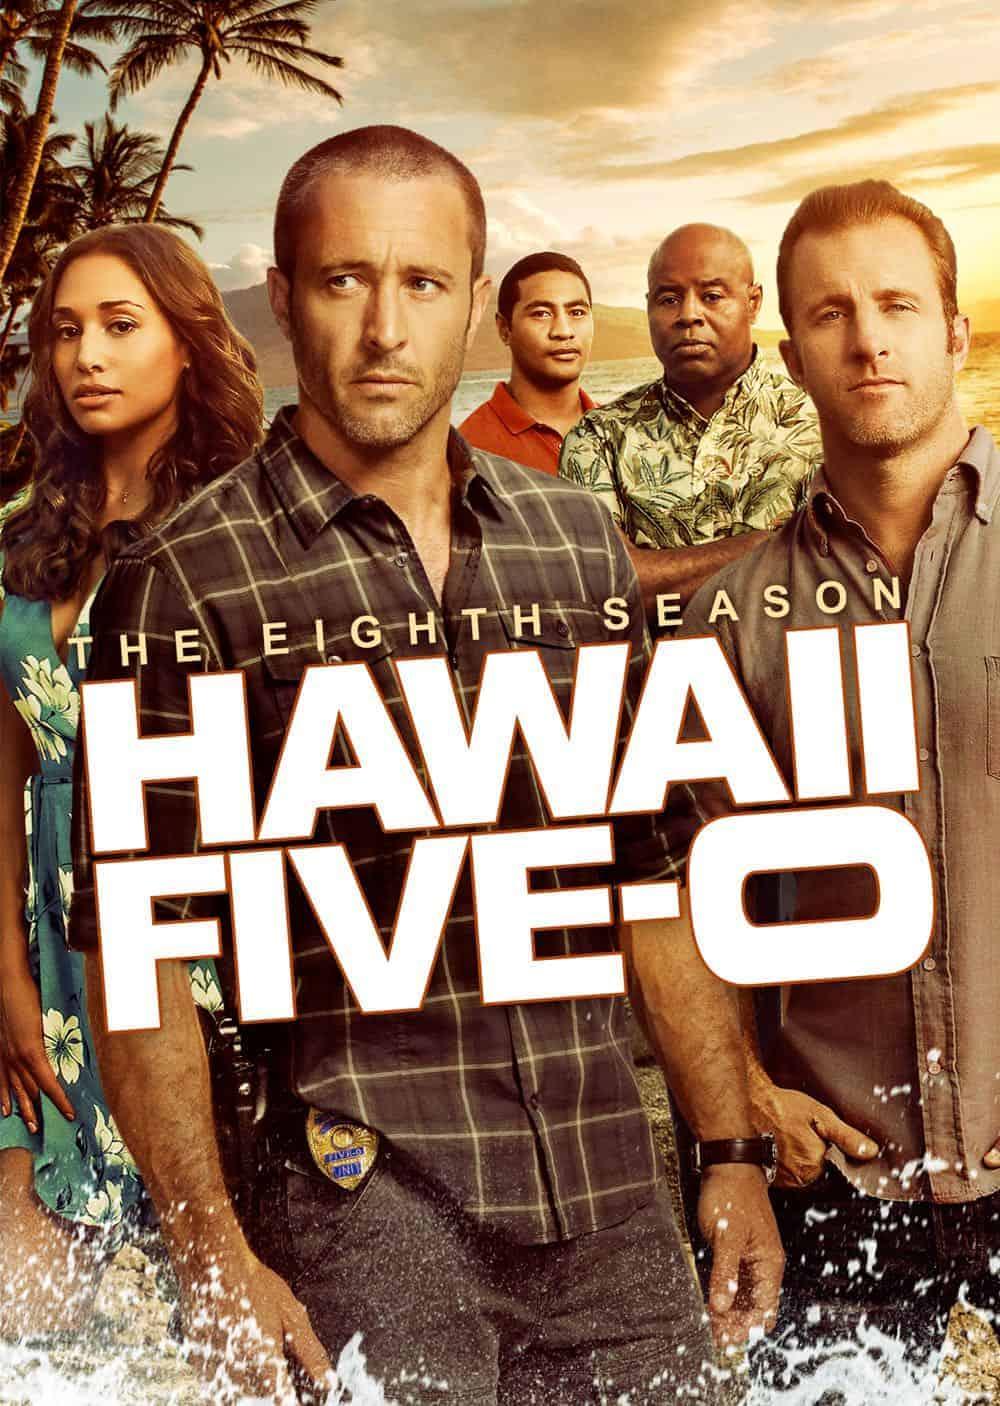 Hawaii Five 0 Season 8 DVD Cover 2